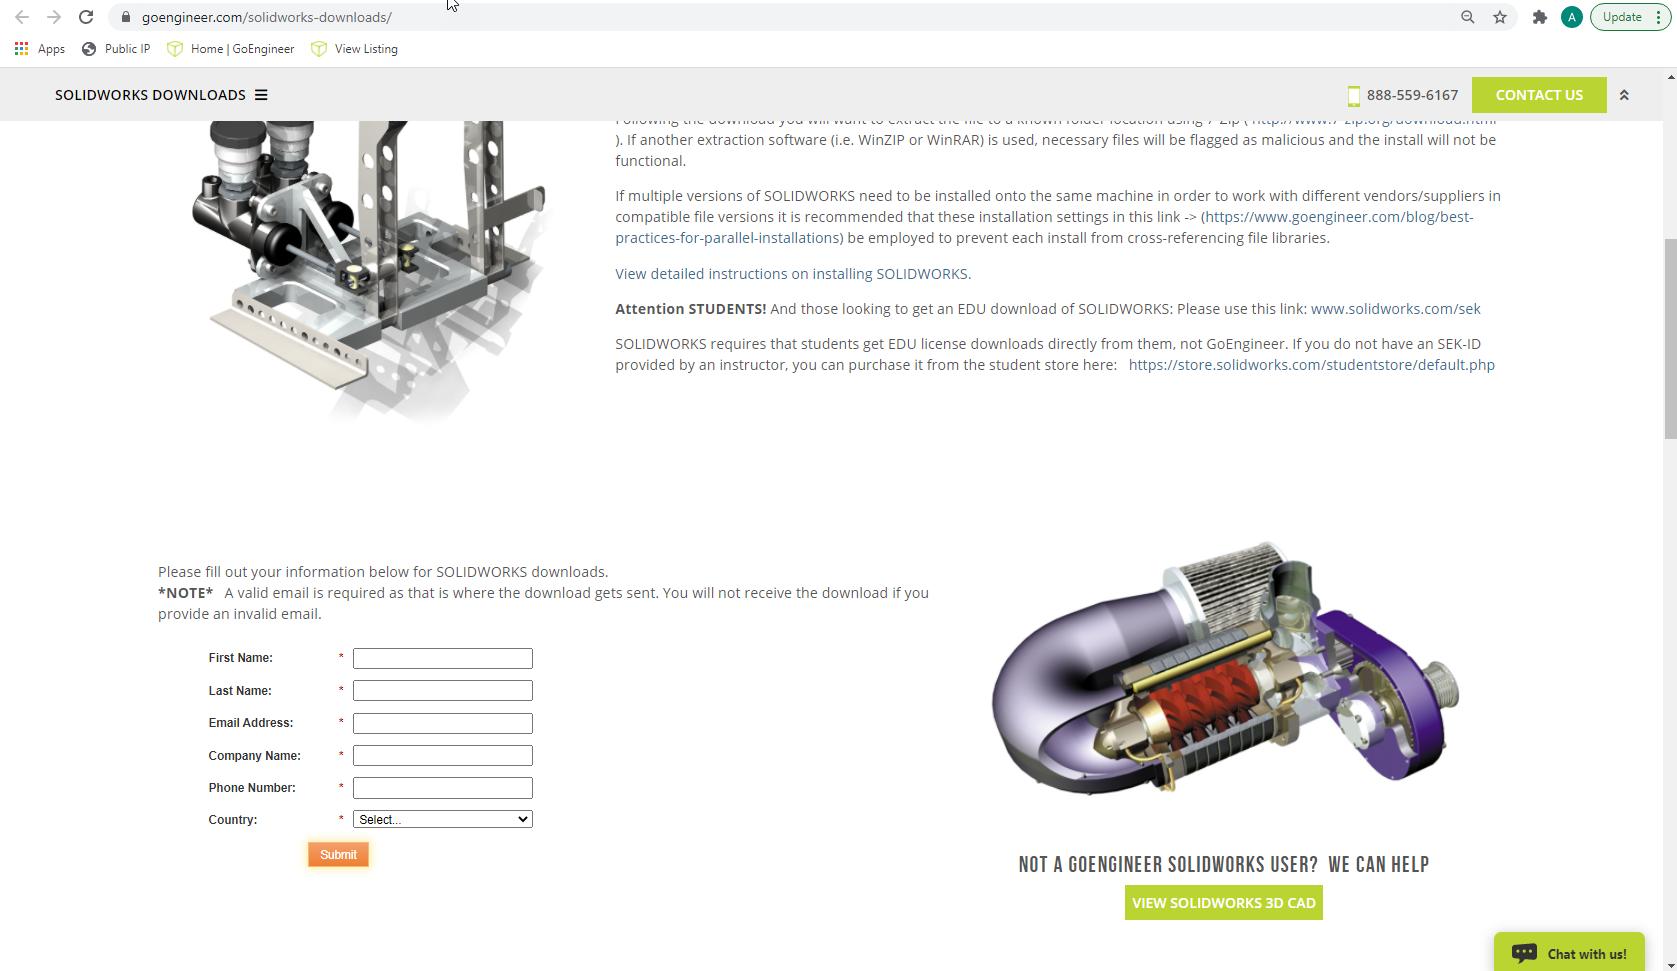 GoEngineer SOLIDWORKS Downloads Page